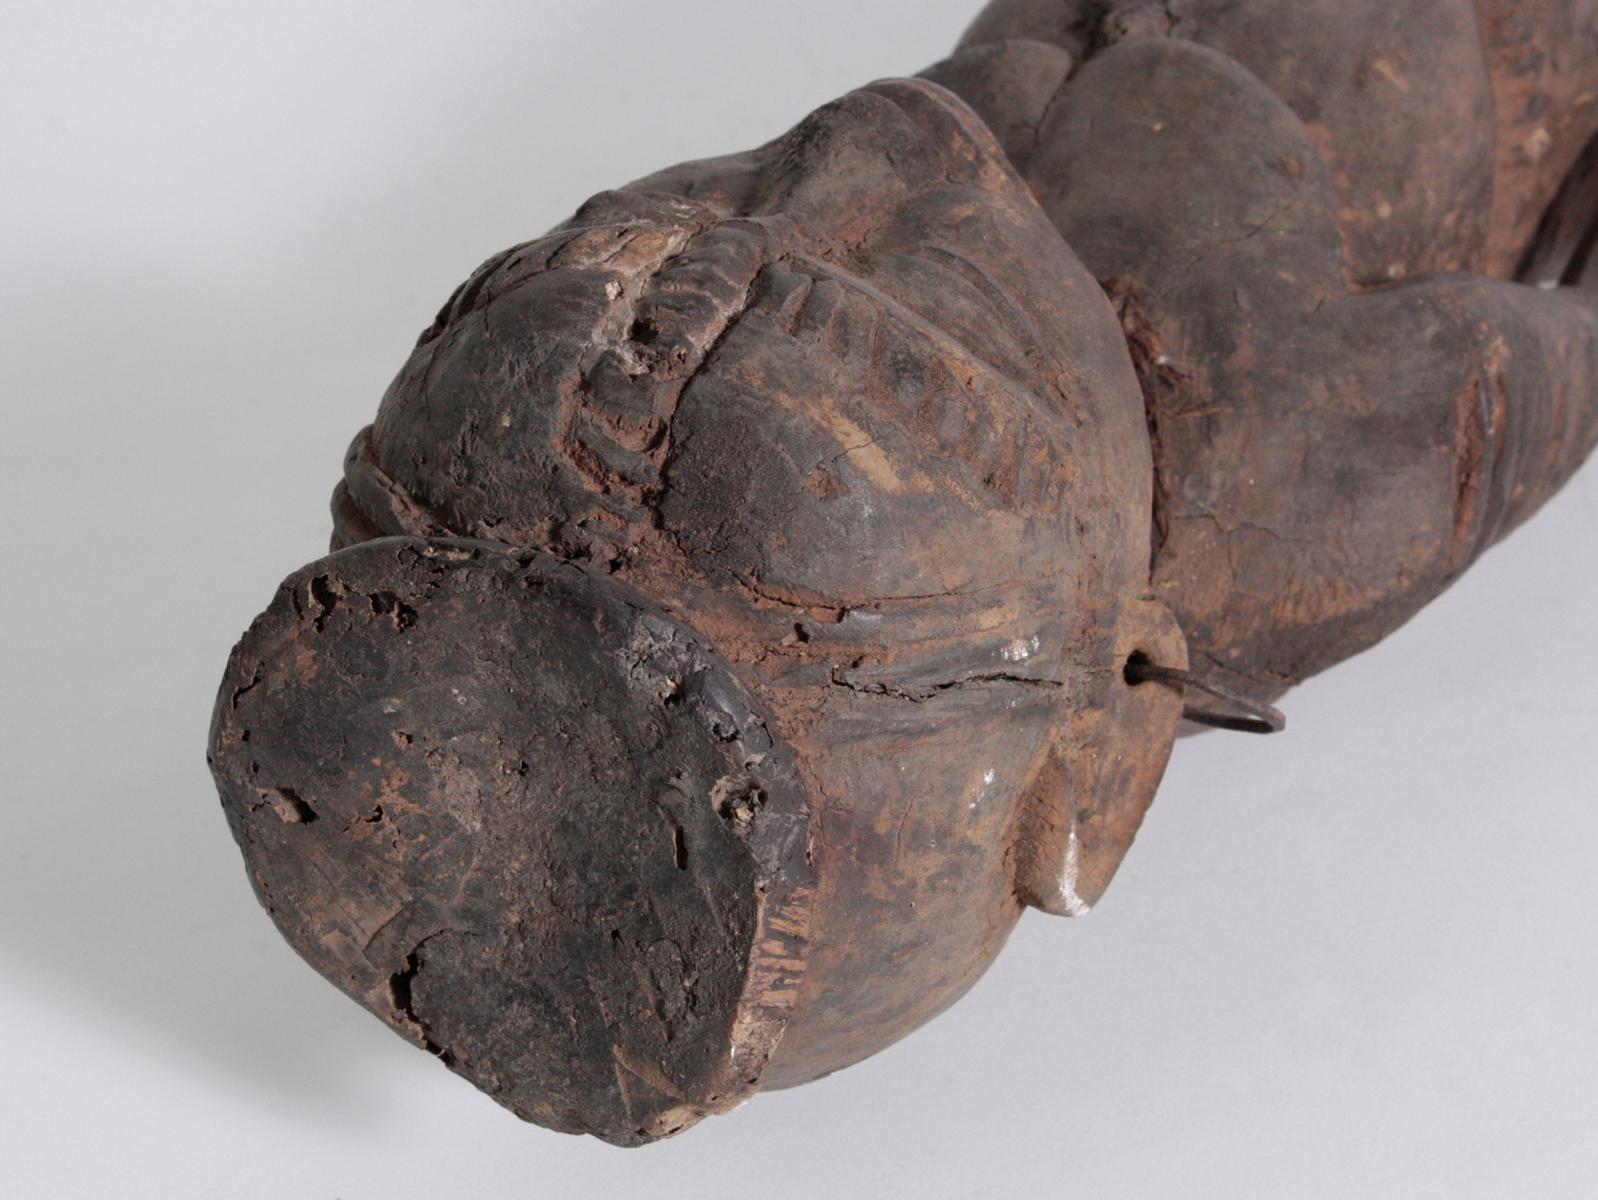 Ältere Ahnen-Figur, Tabwa, D. R. Kongo-14